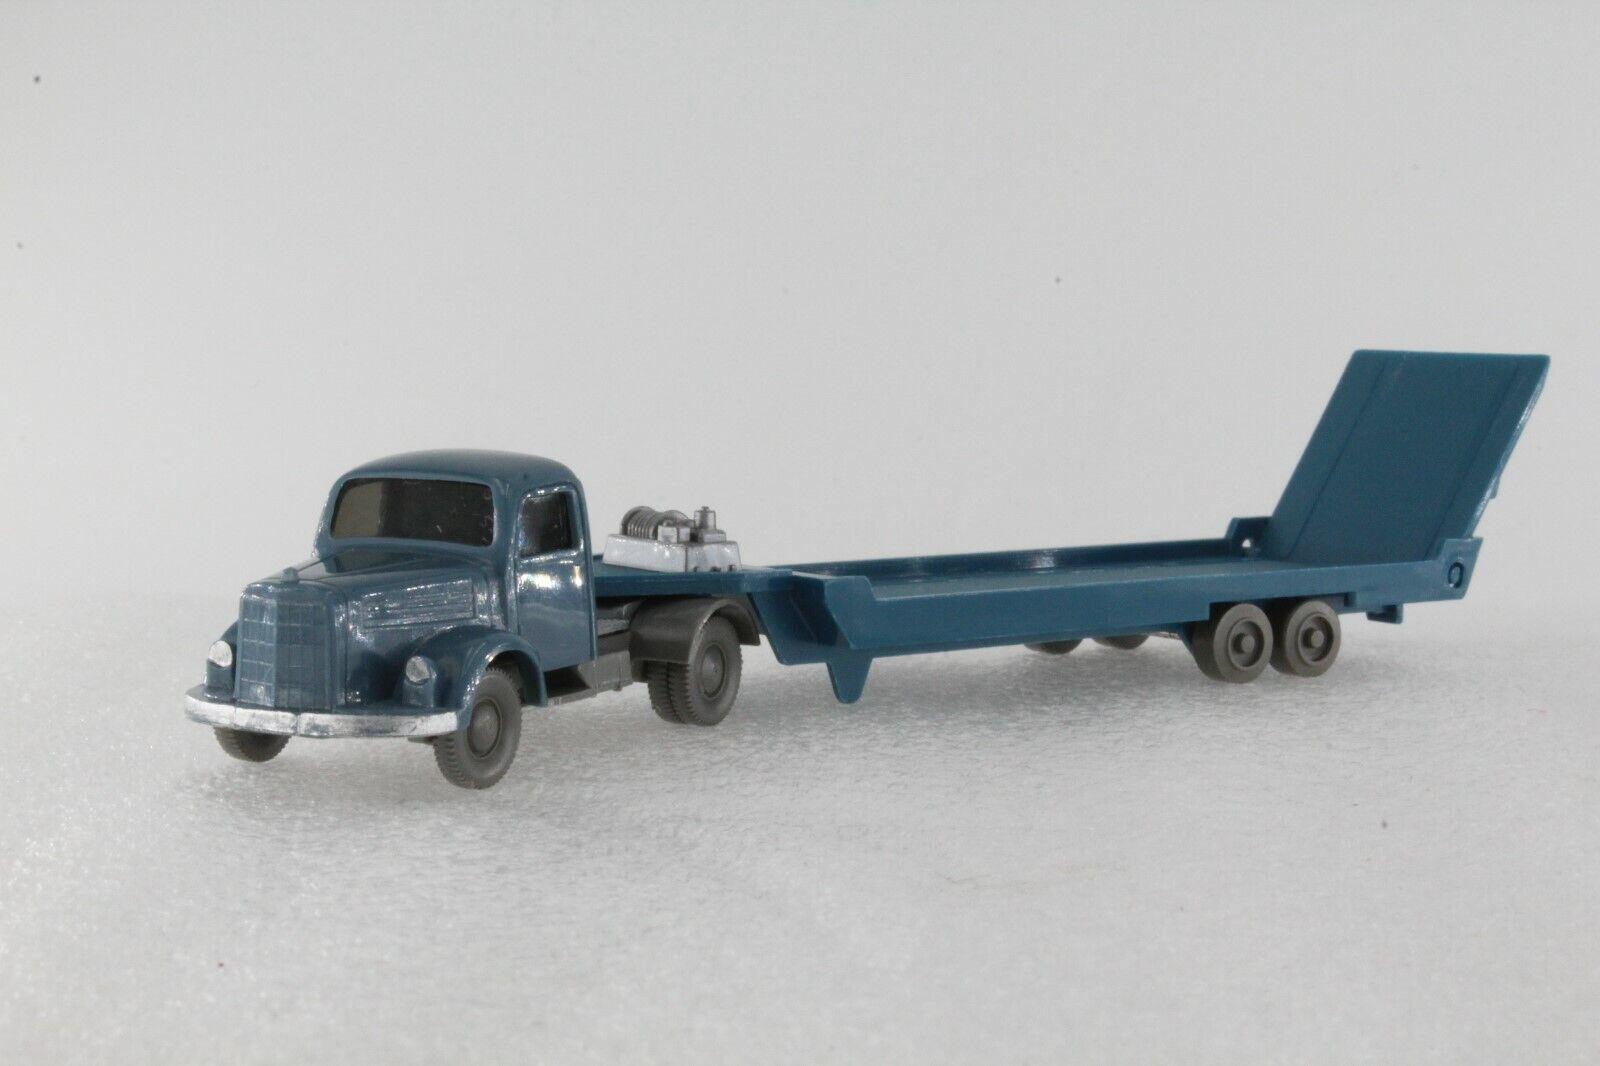 A.S.S WIKING ALT LKW MERCEDES MB 3500 TIEFLADER 1961 GK 490 6 CS 719 1B  RMG